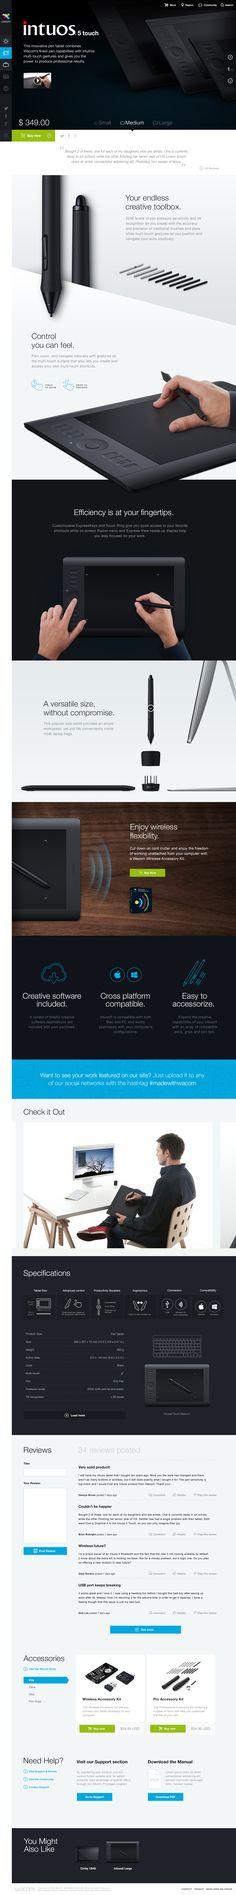 https://www.behance.net/gallery/18168491/Wacomcom-Re-Design